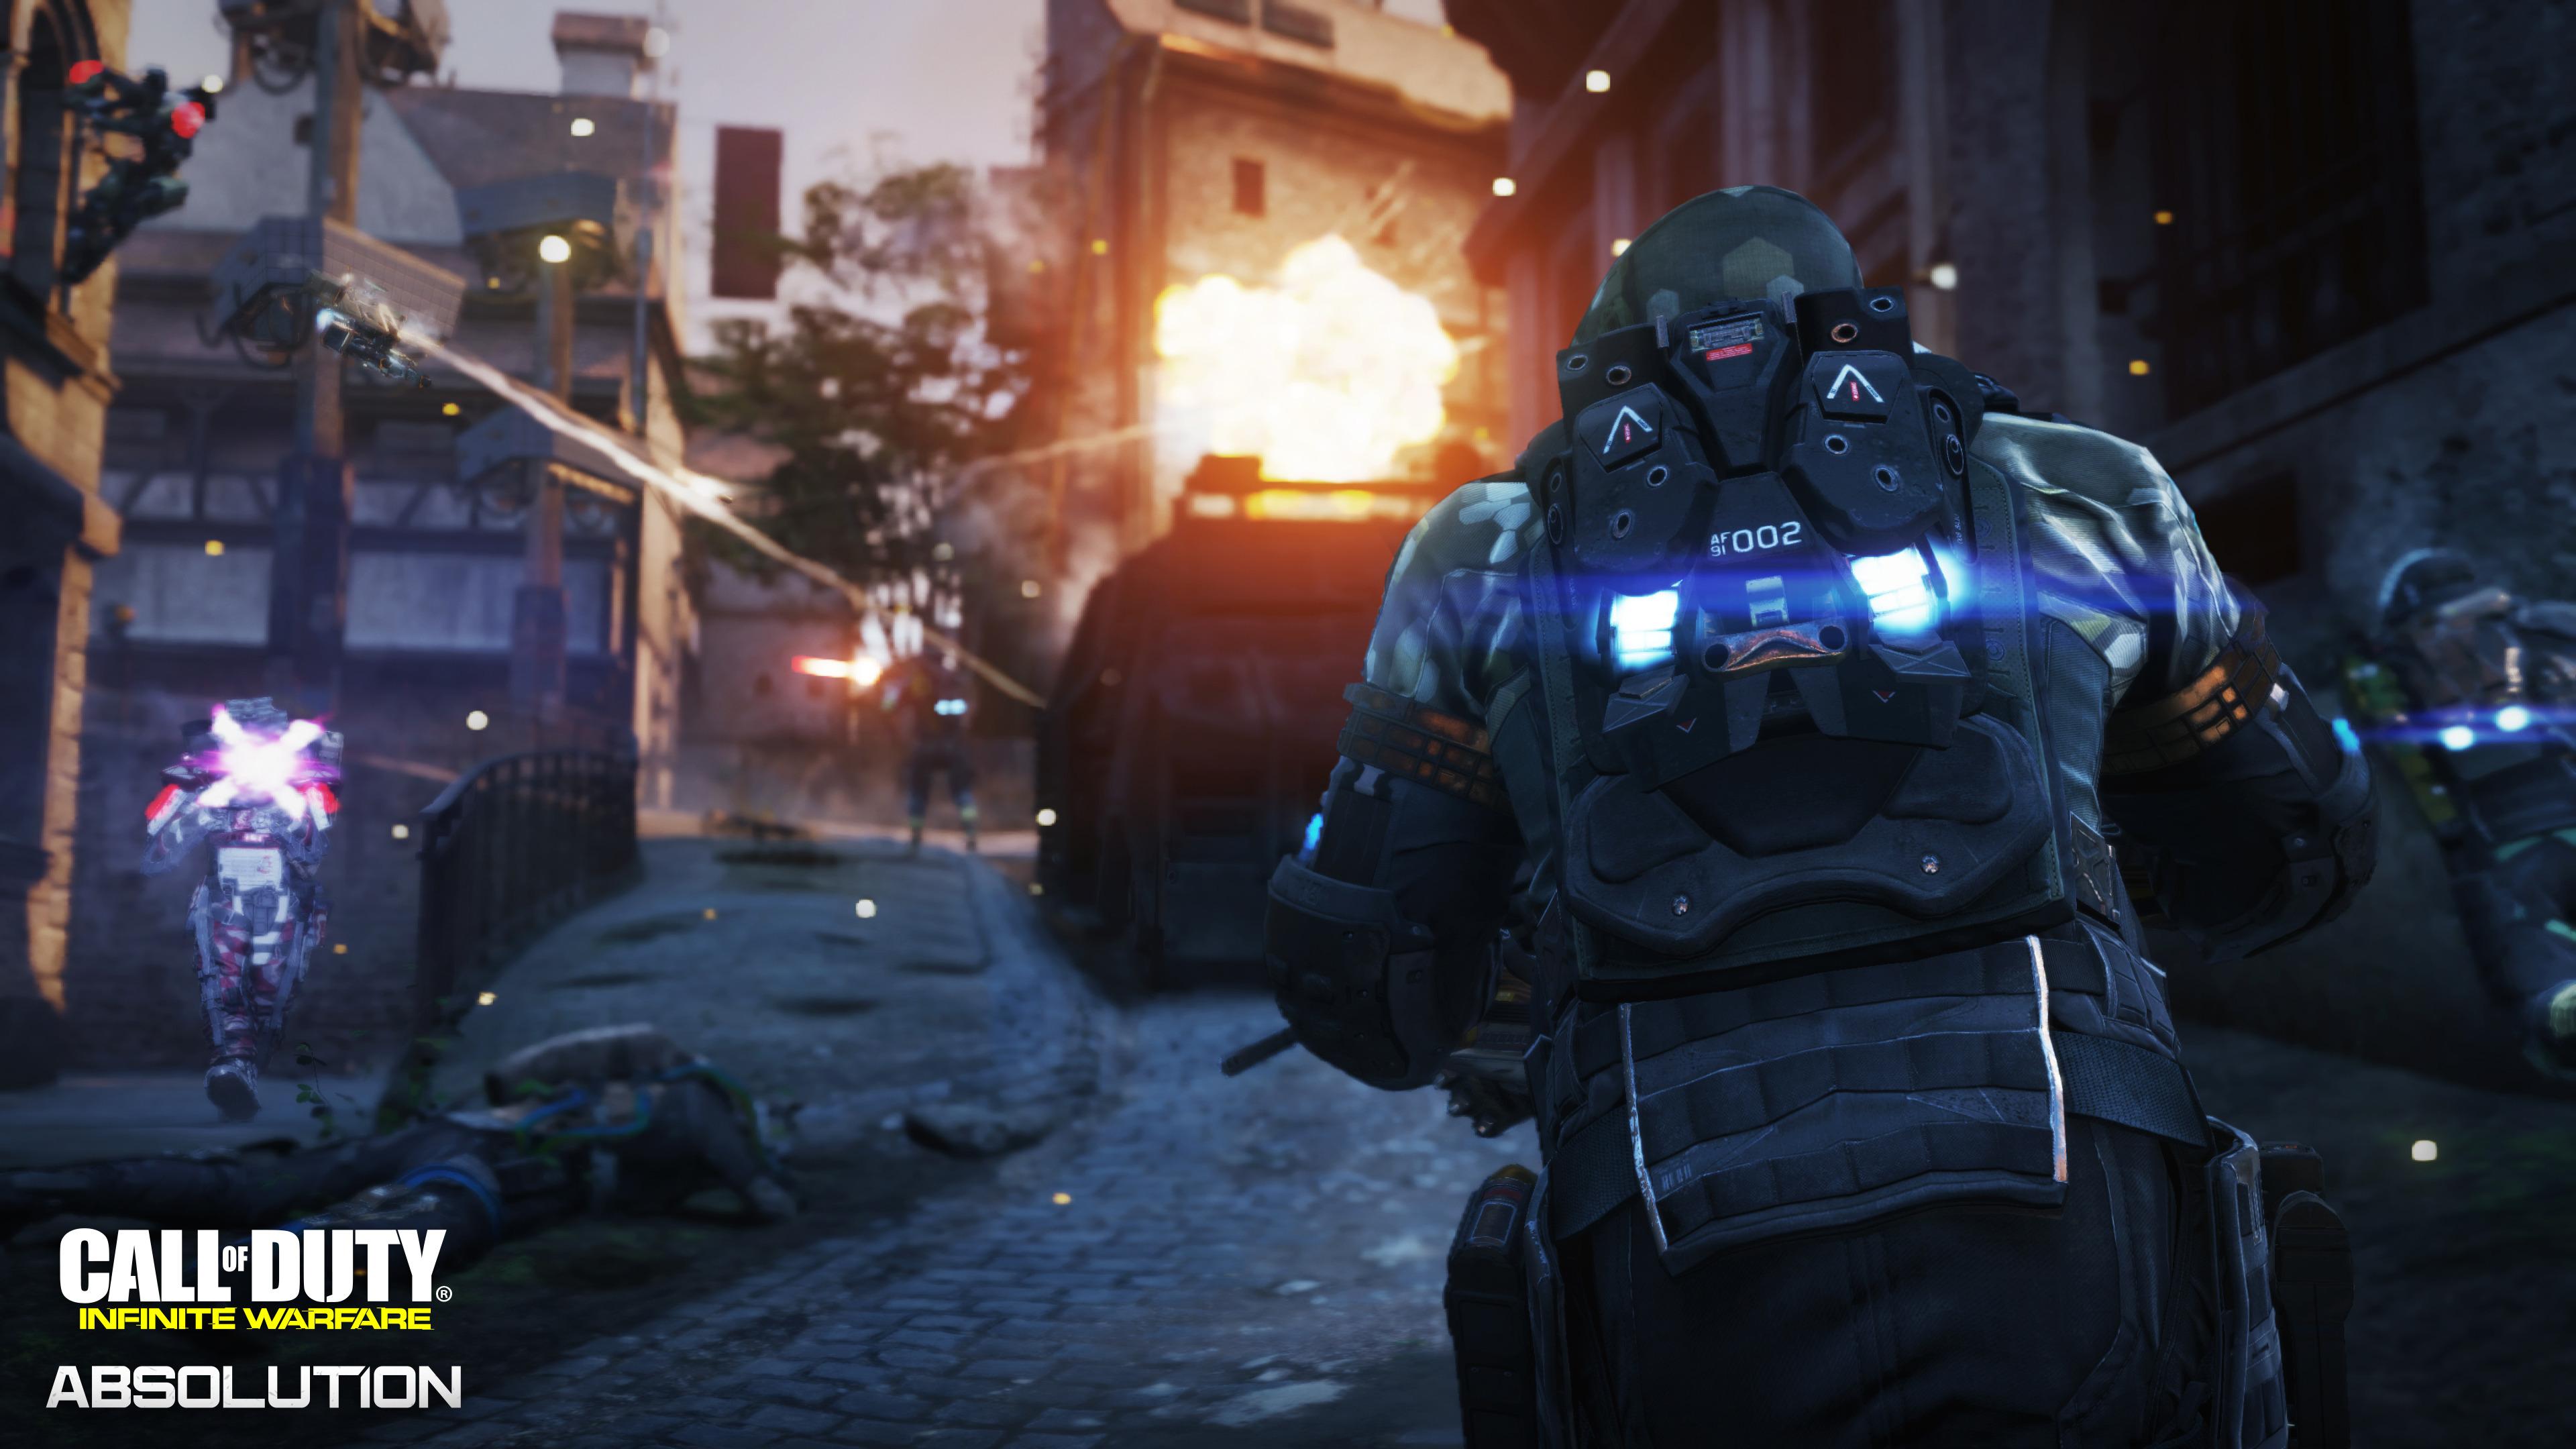 Cod Infinite Warfare Wallpaper: Call Of Duty Infinite Warfare Absolution Dlc3 2017, HD